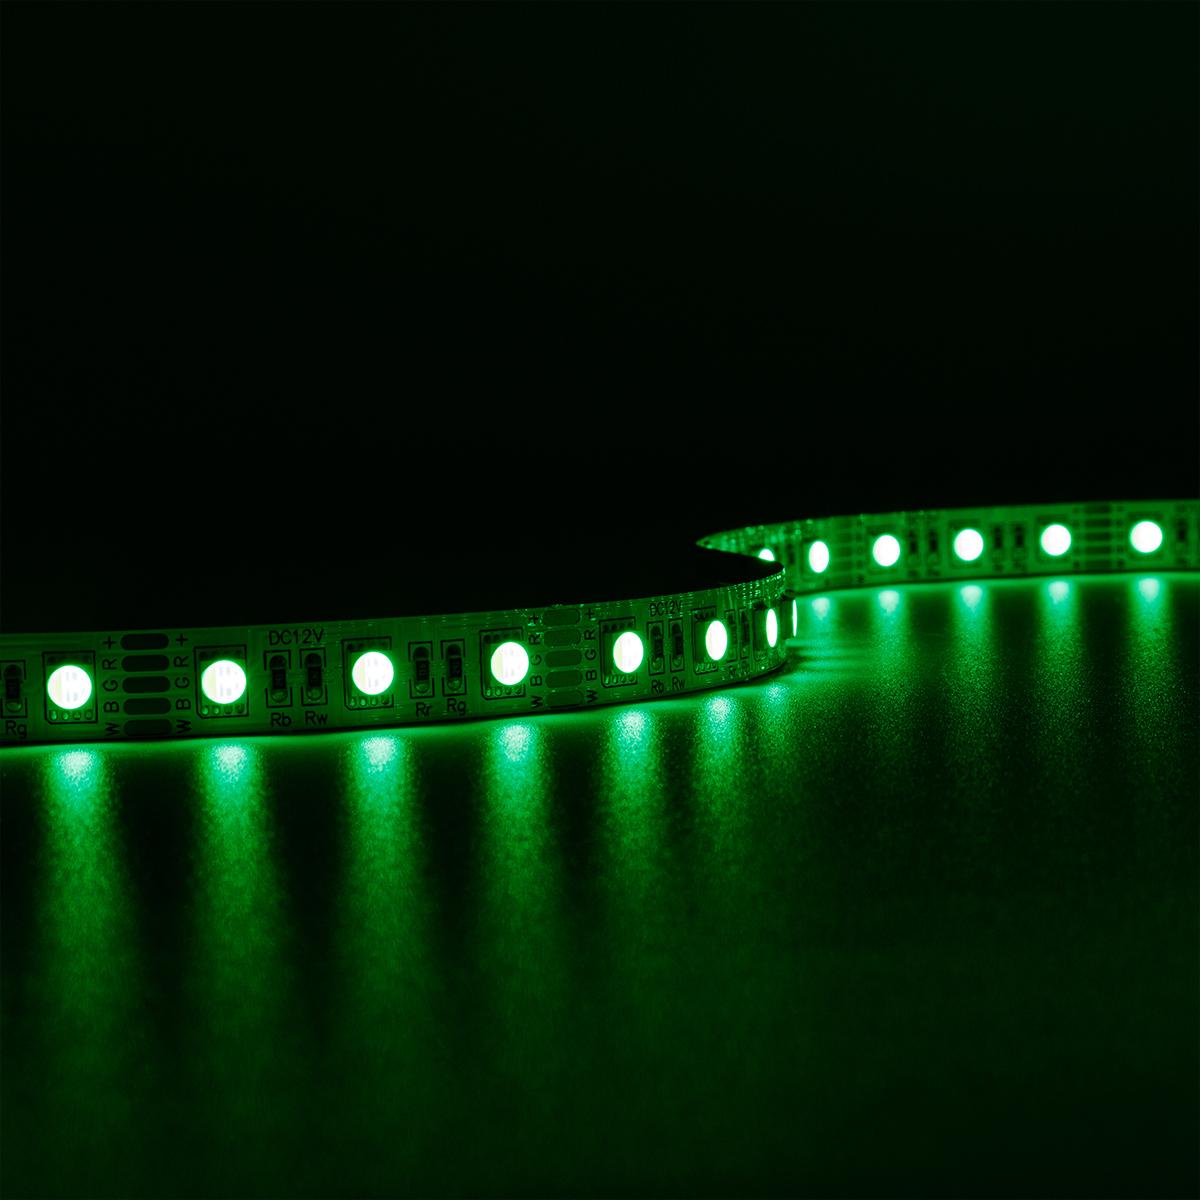 Strip RGBW 12V 5M 14,4W/m 60LED/m 12mm IP20 Farbwechsel RGB+4000K